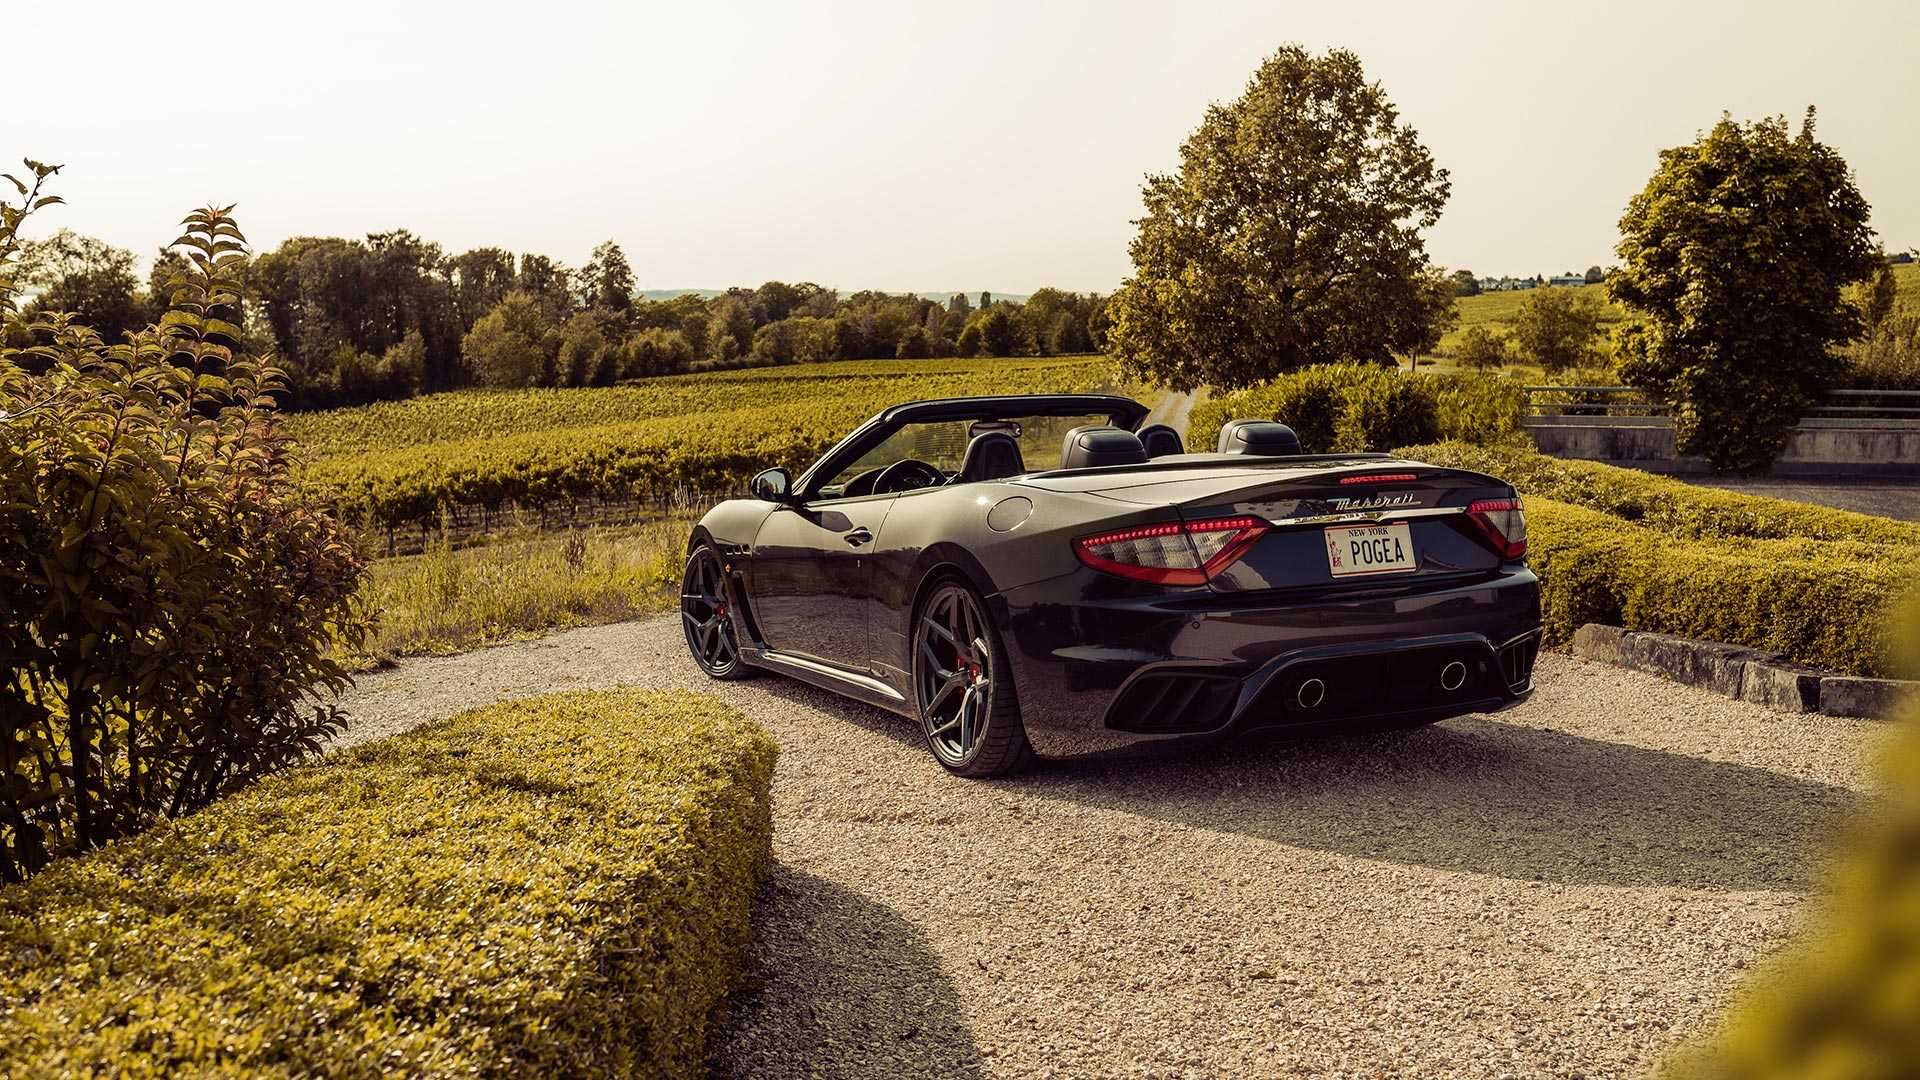 Maserati GranCabrio by Pogea Racing (4)